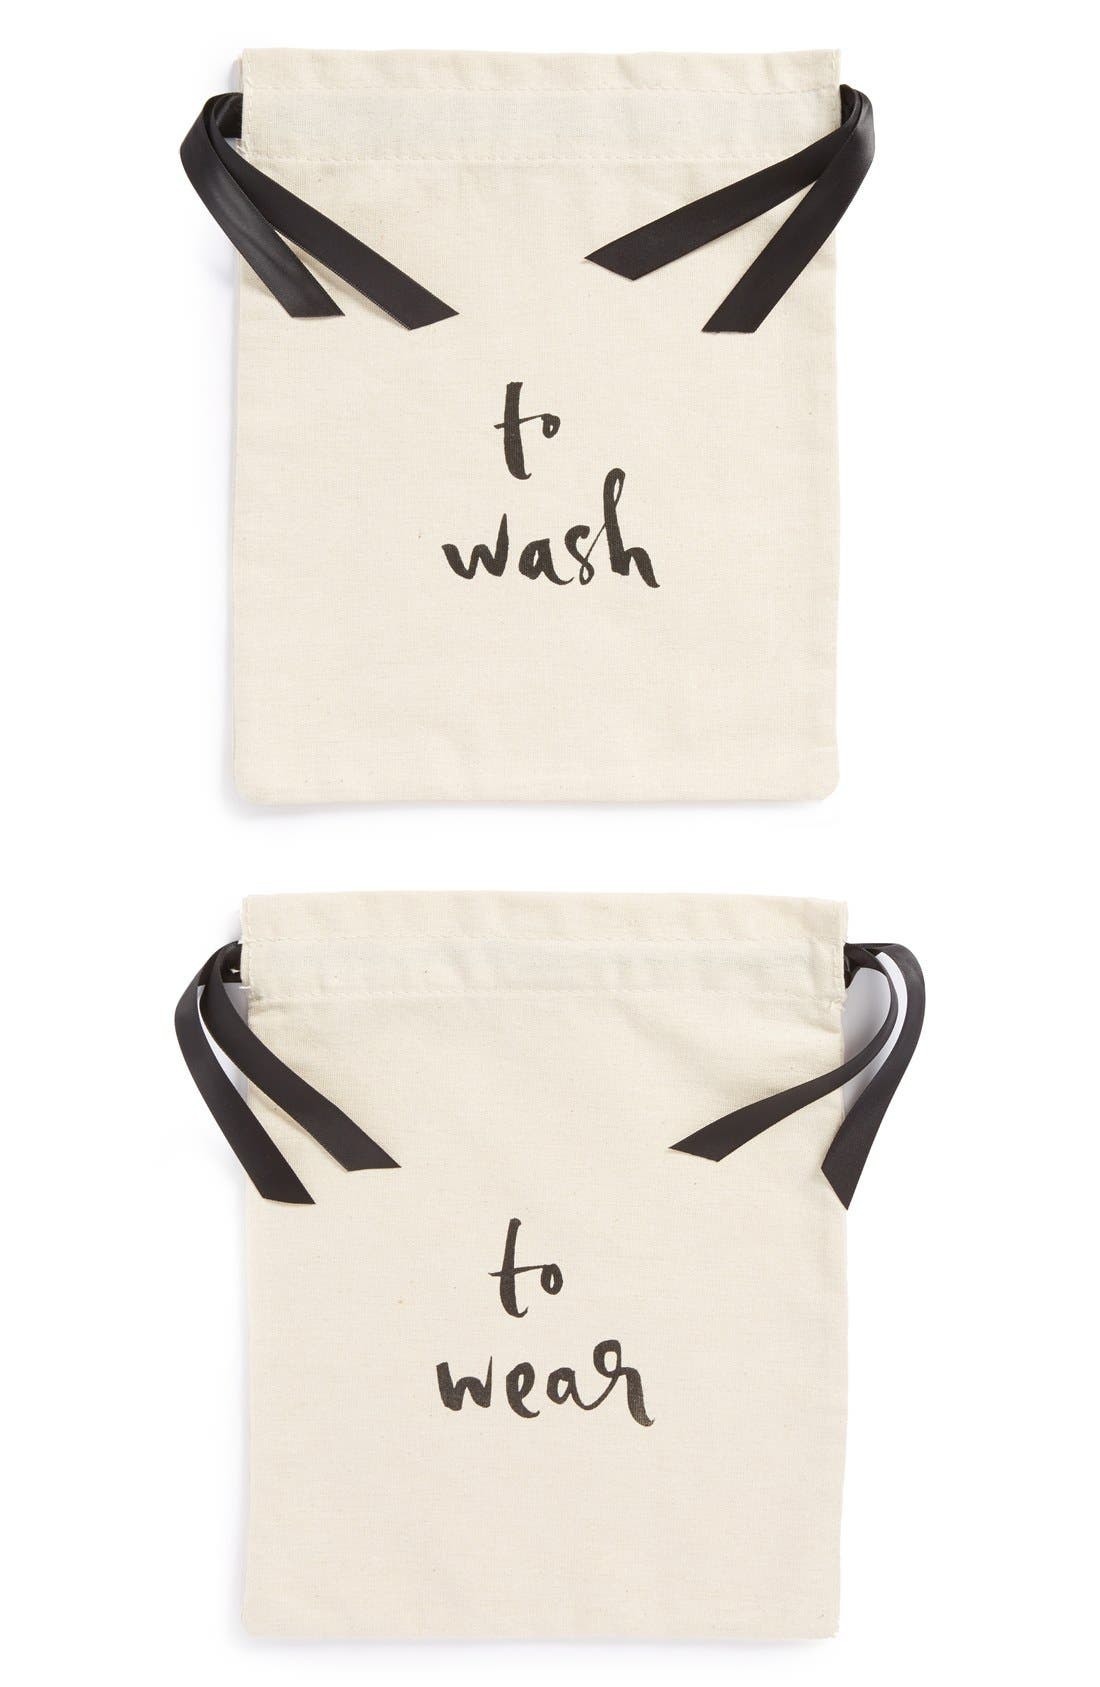 Alternate Image 1 Selected - kate spade new york 'wash and wear' lingerie bag set